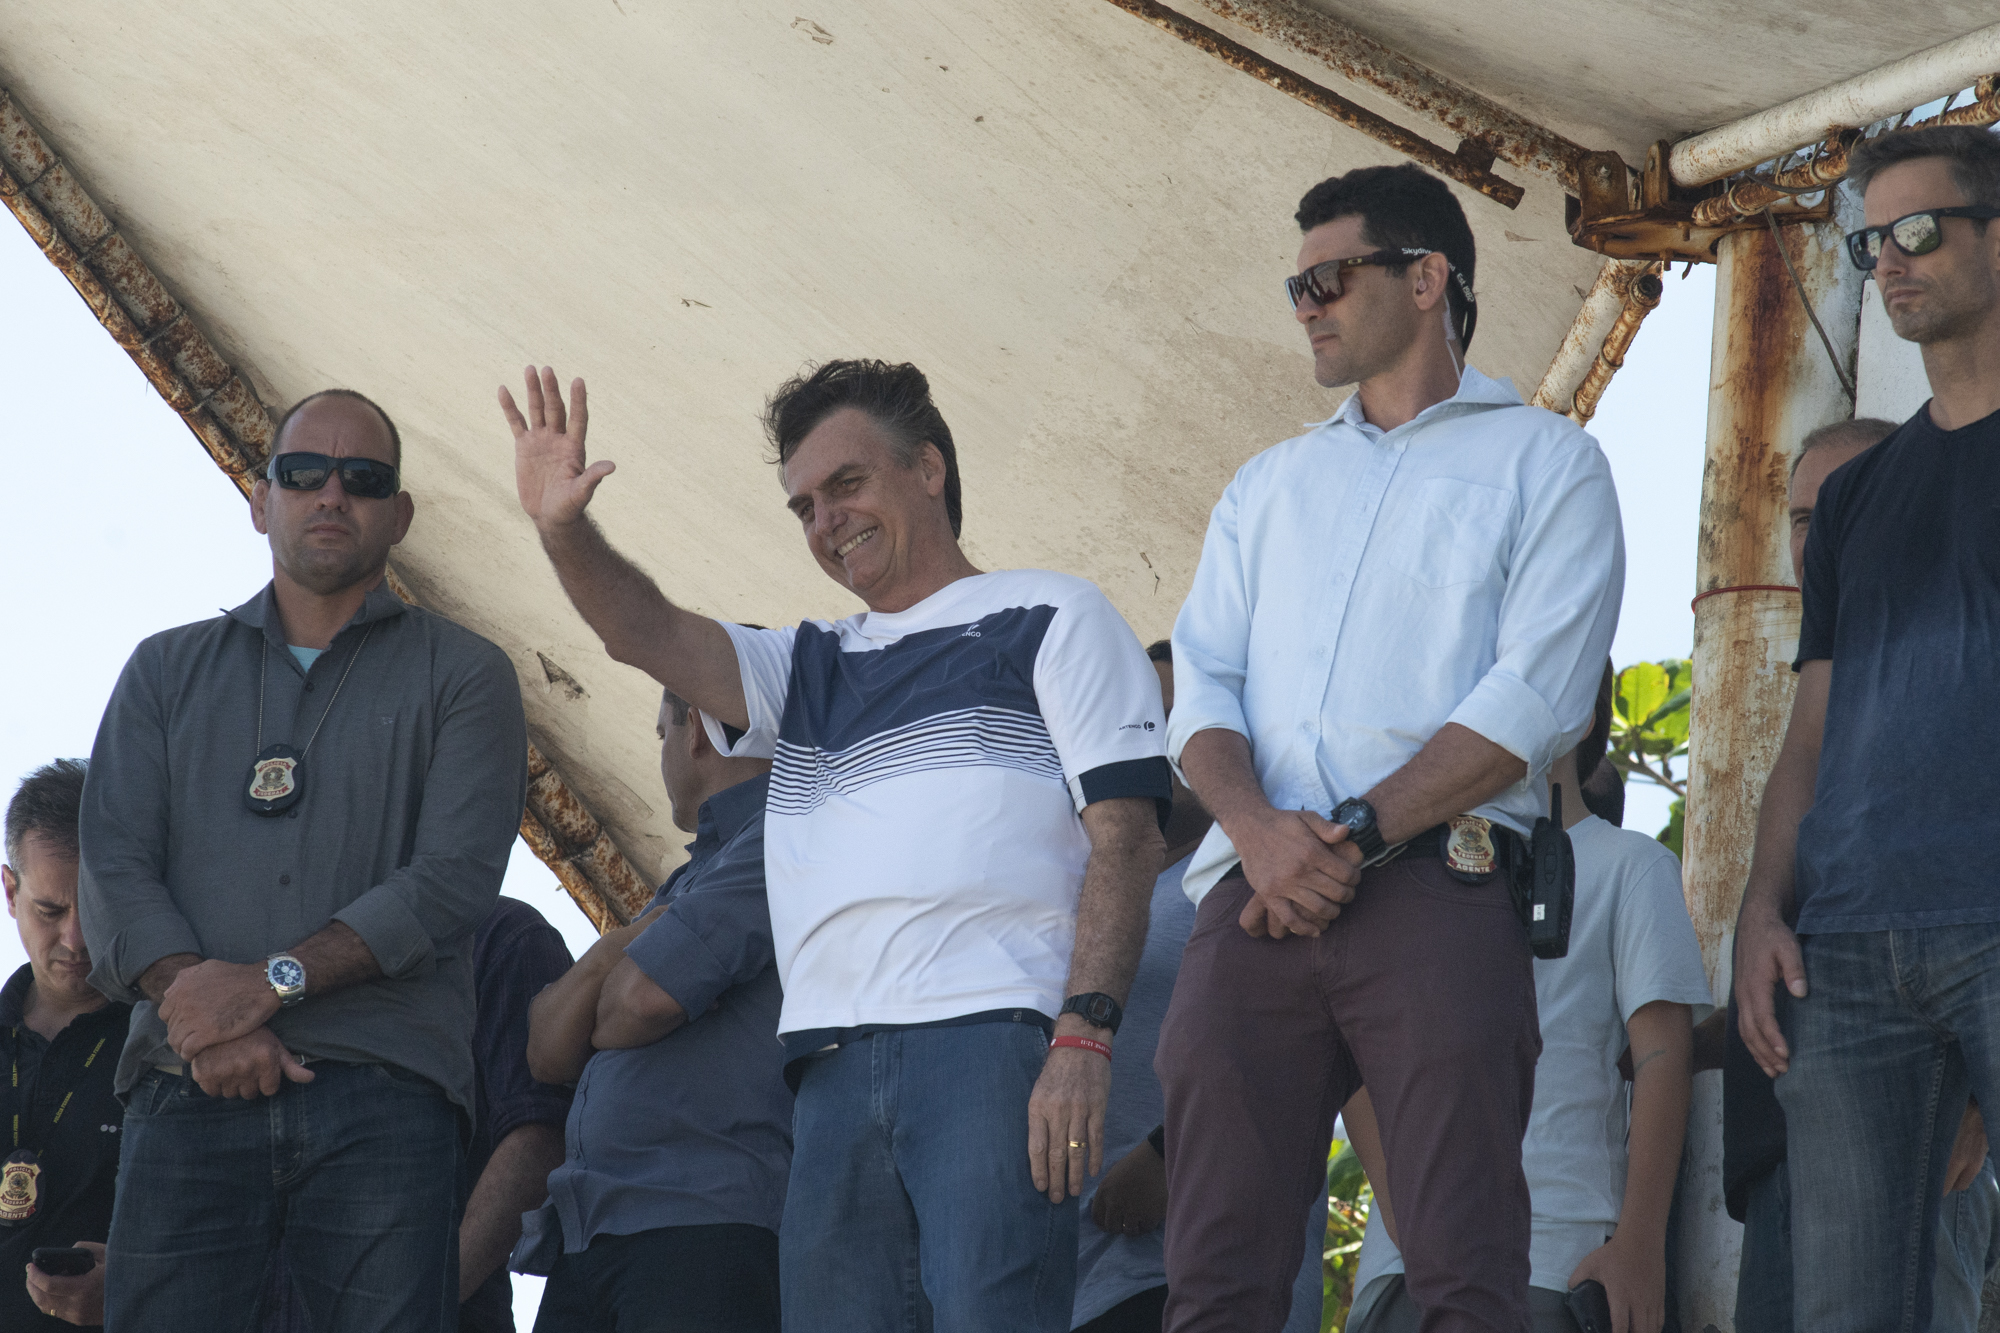 Brazil's new president-elect, Jair Bolsonaro, waves to supporters as he watches airplanes performing near his condominium at Barra da Tijuca neighbourhood in Rio de Janeiro, Brazil October 31, 2018. REUTERS/Lucas Landau